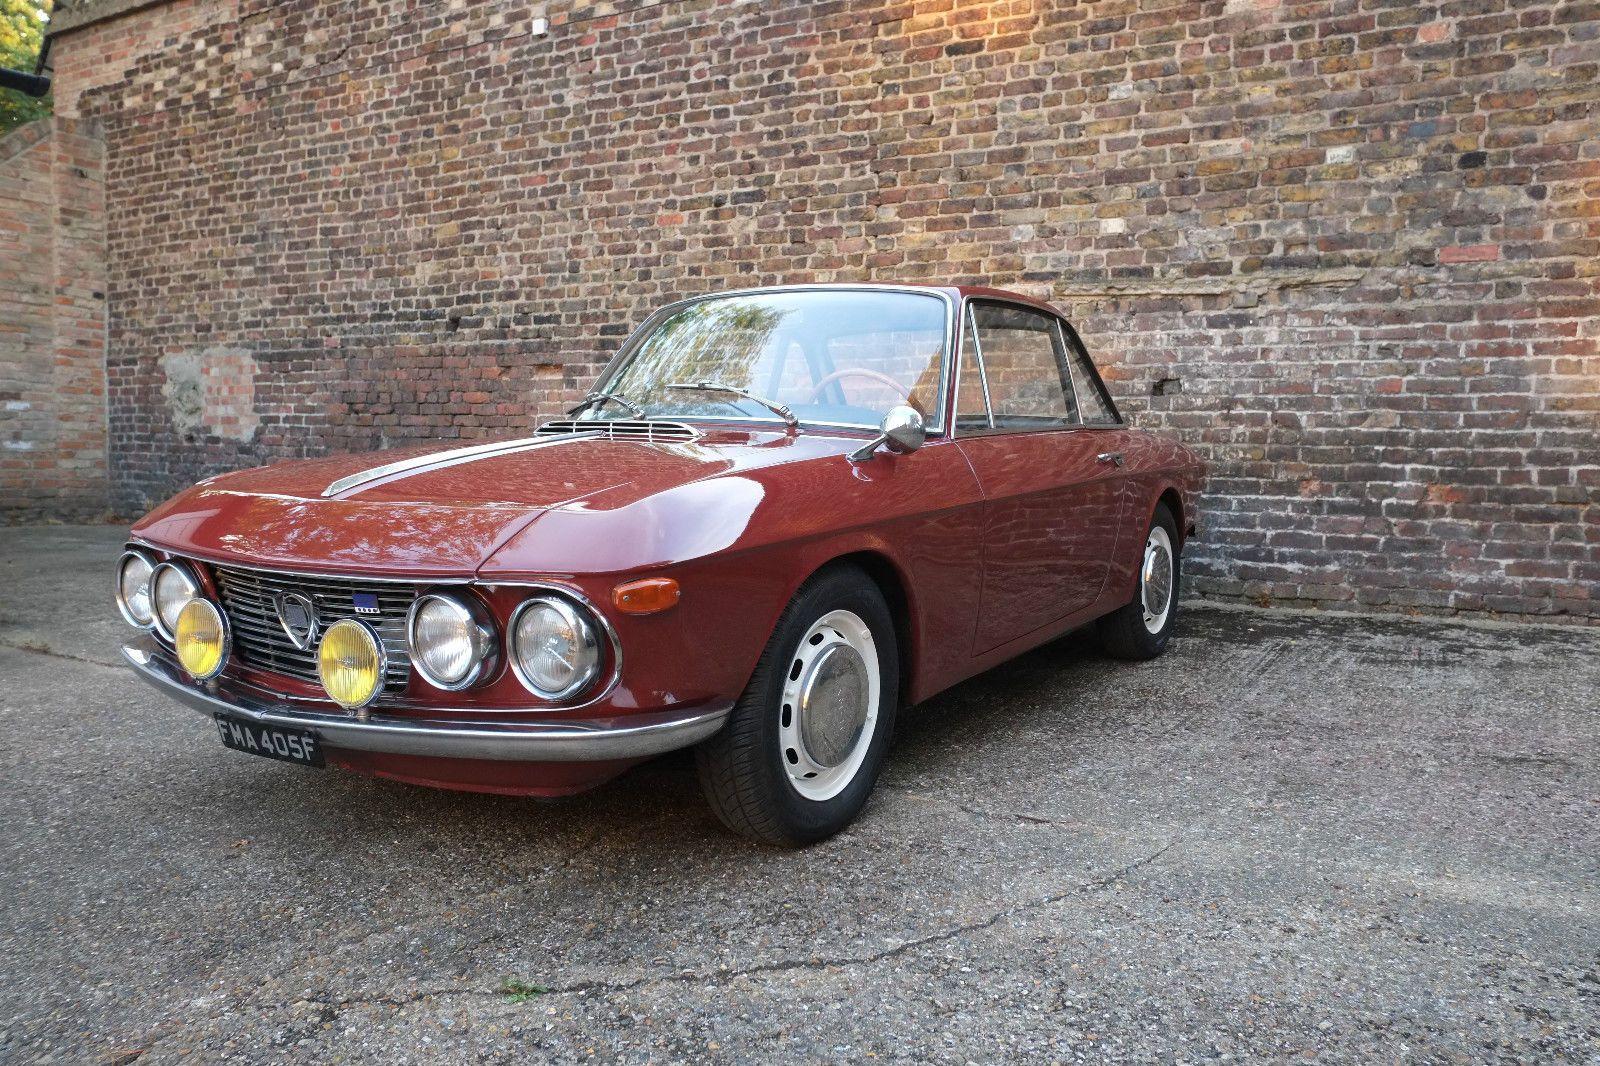 LANCIA FULVIA S1 RALLYE 1.3 1968